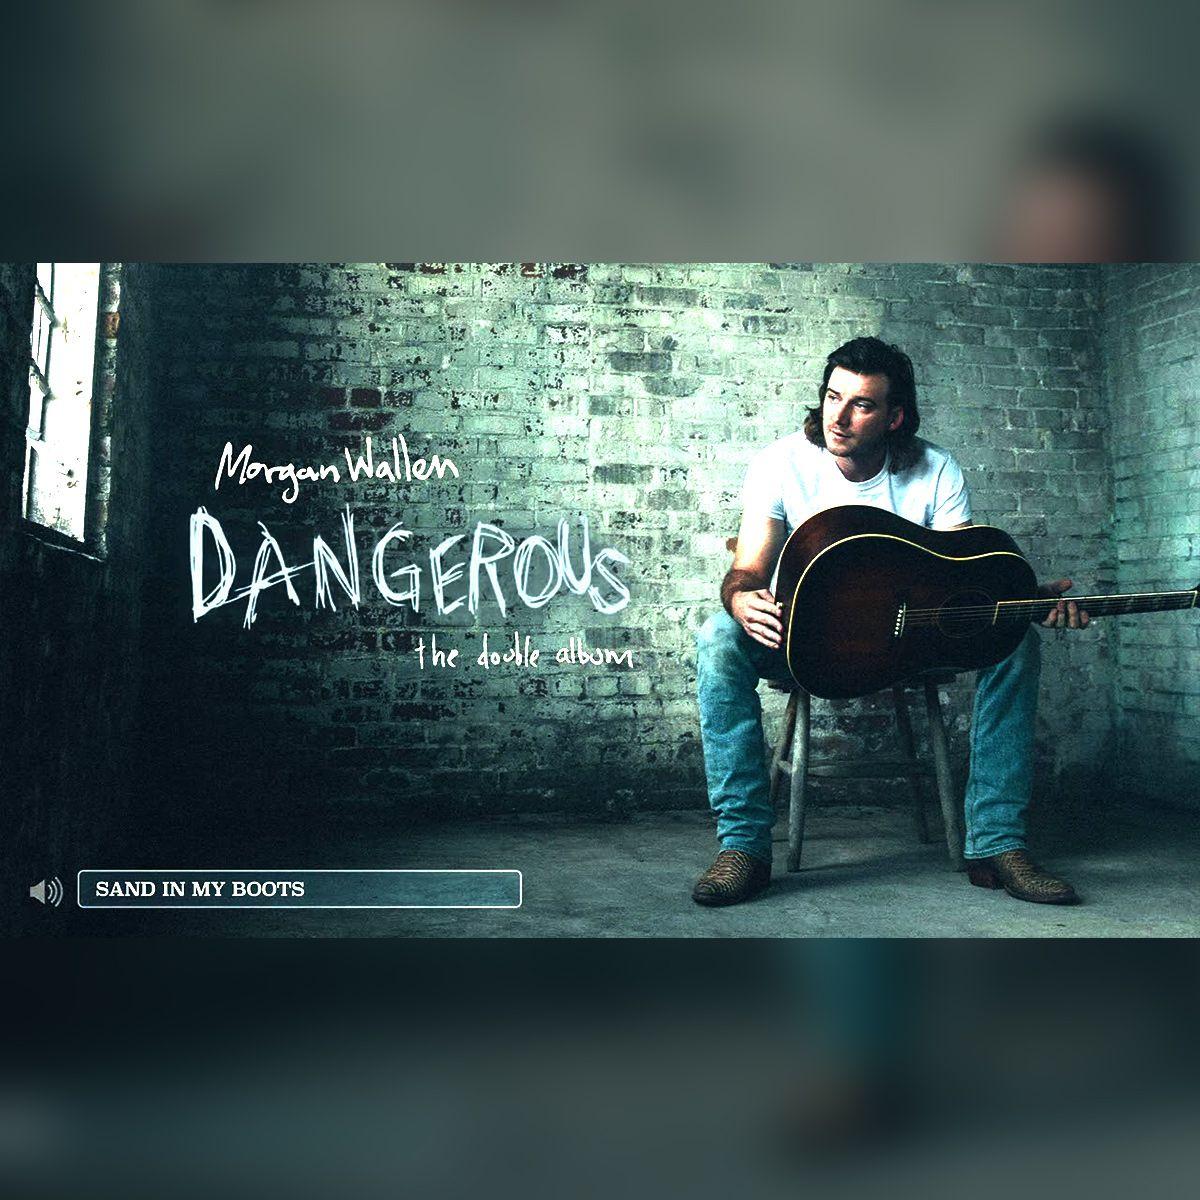 Sand In My Boots The Dangerous Sessions Morgan Wallen New Music Releases Wavwax In 2021 Sand Dangerous Morgan Wallen